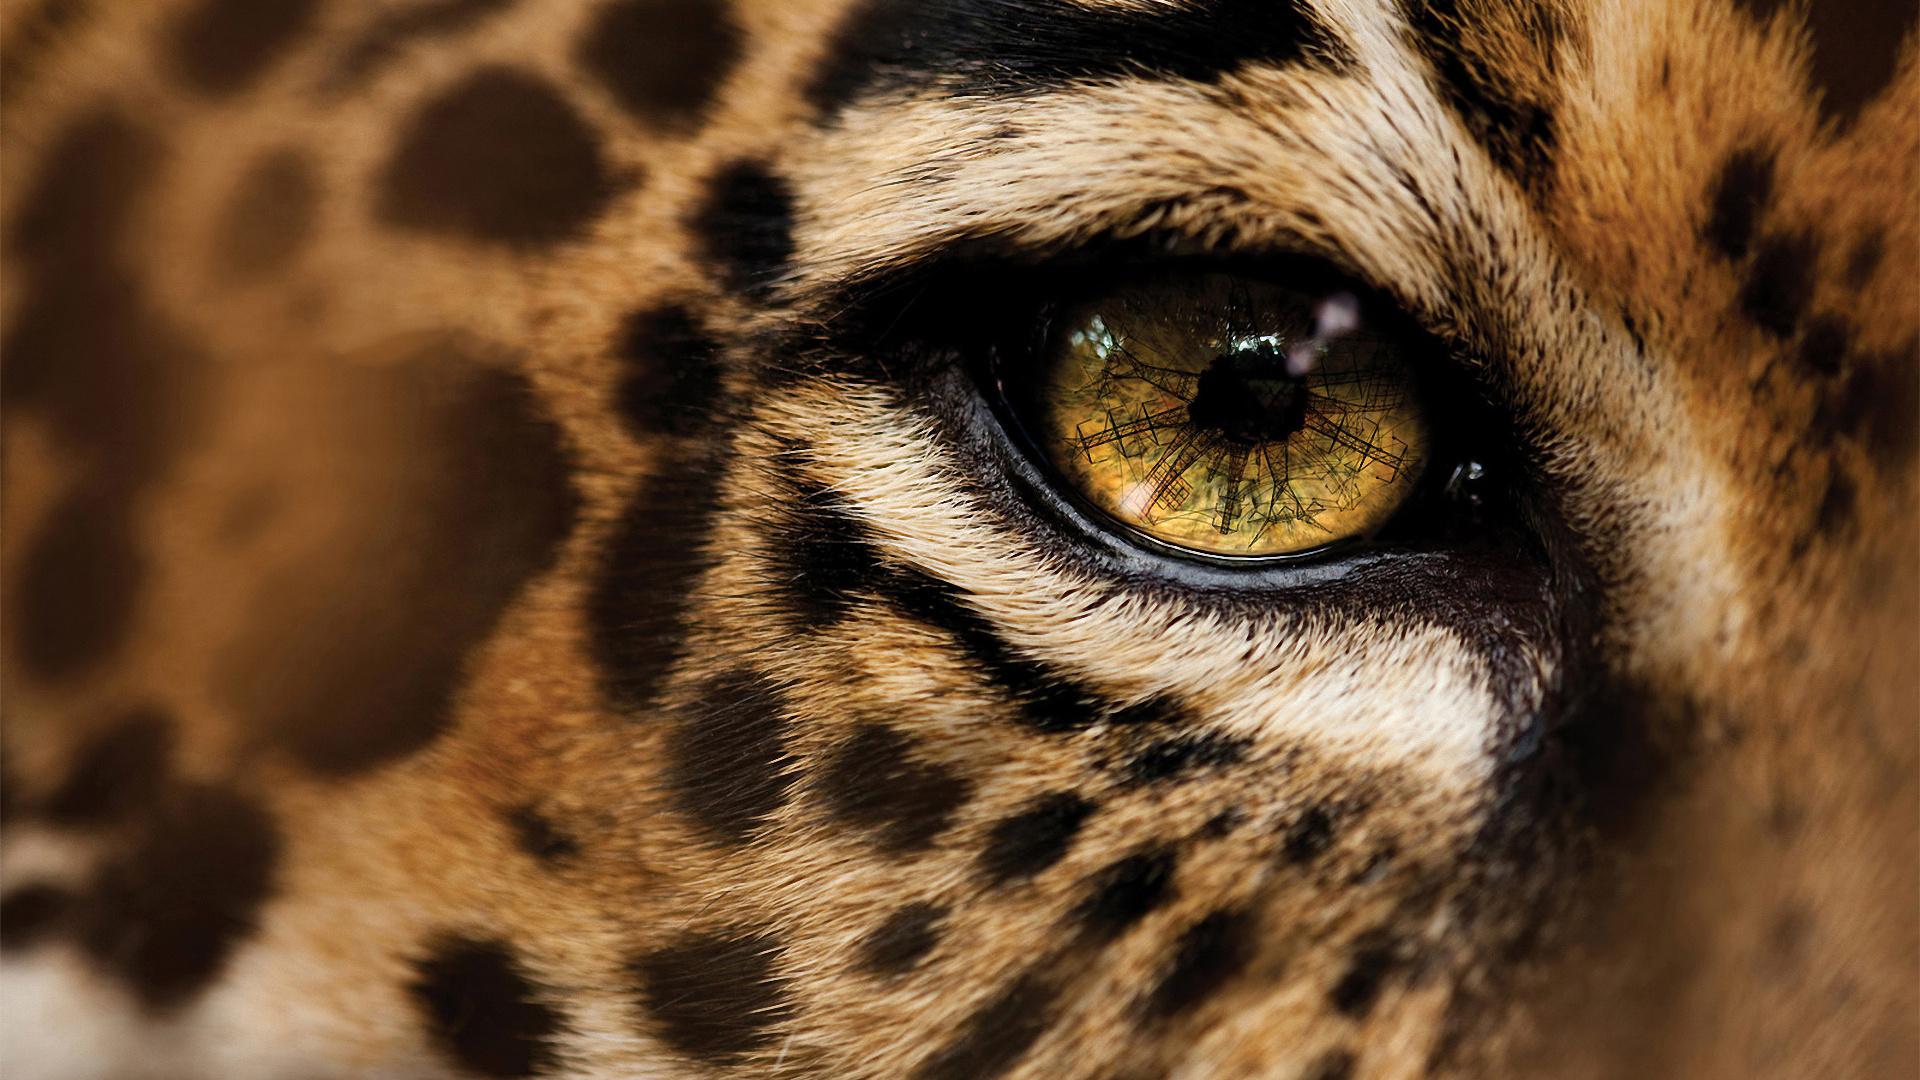 Cute Cheetah Wallpapers Cheetah Wallpapers Hd Pixelstalk Net